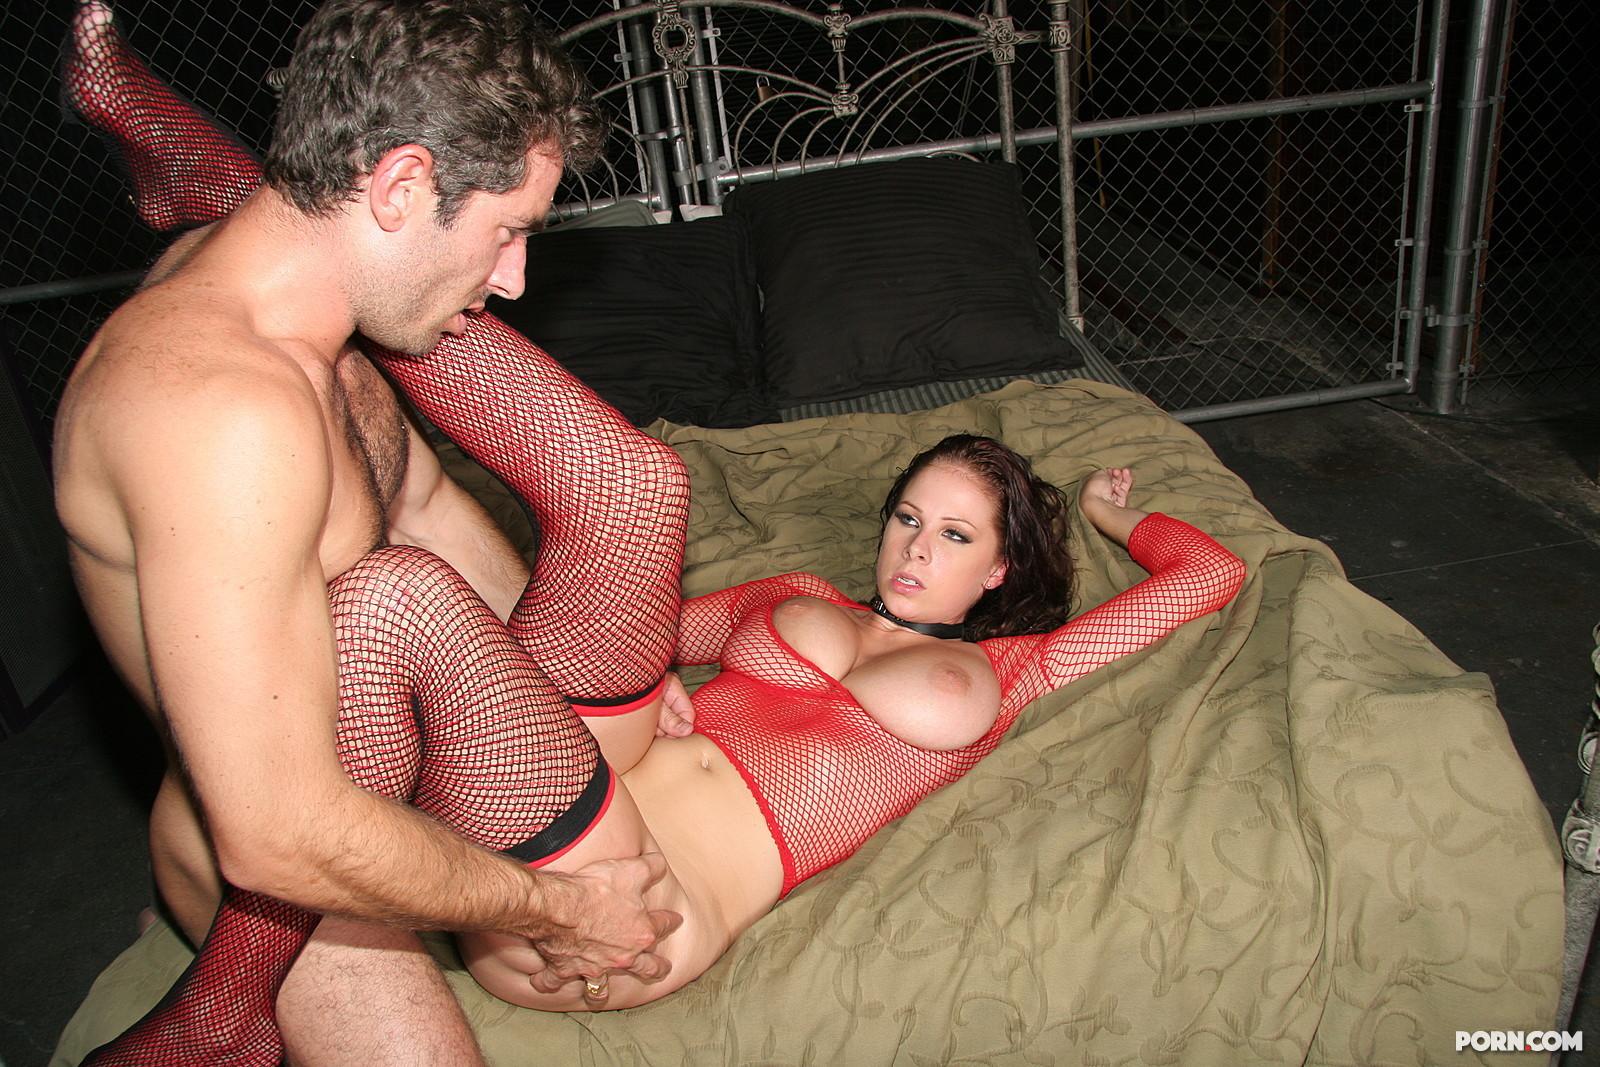 Рабыни ублажают хозяина порно онлайн 9 фотография